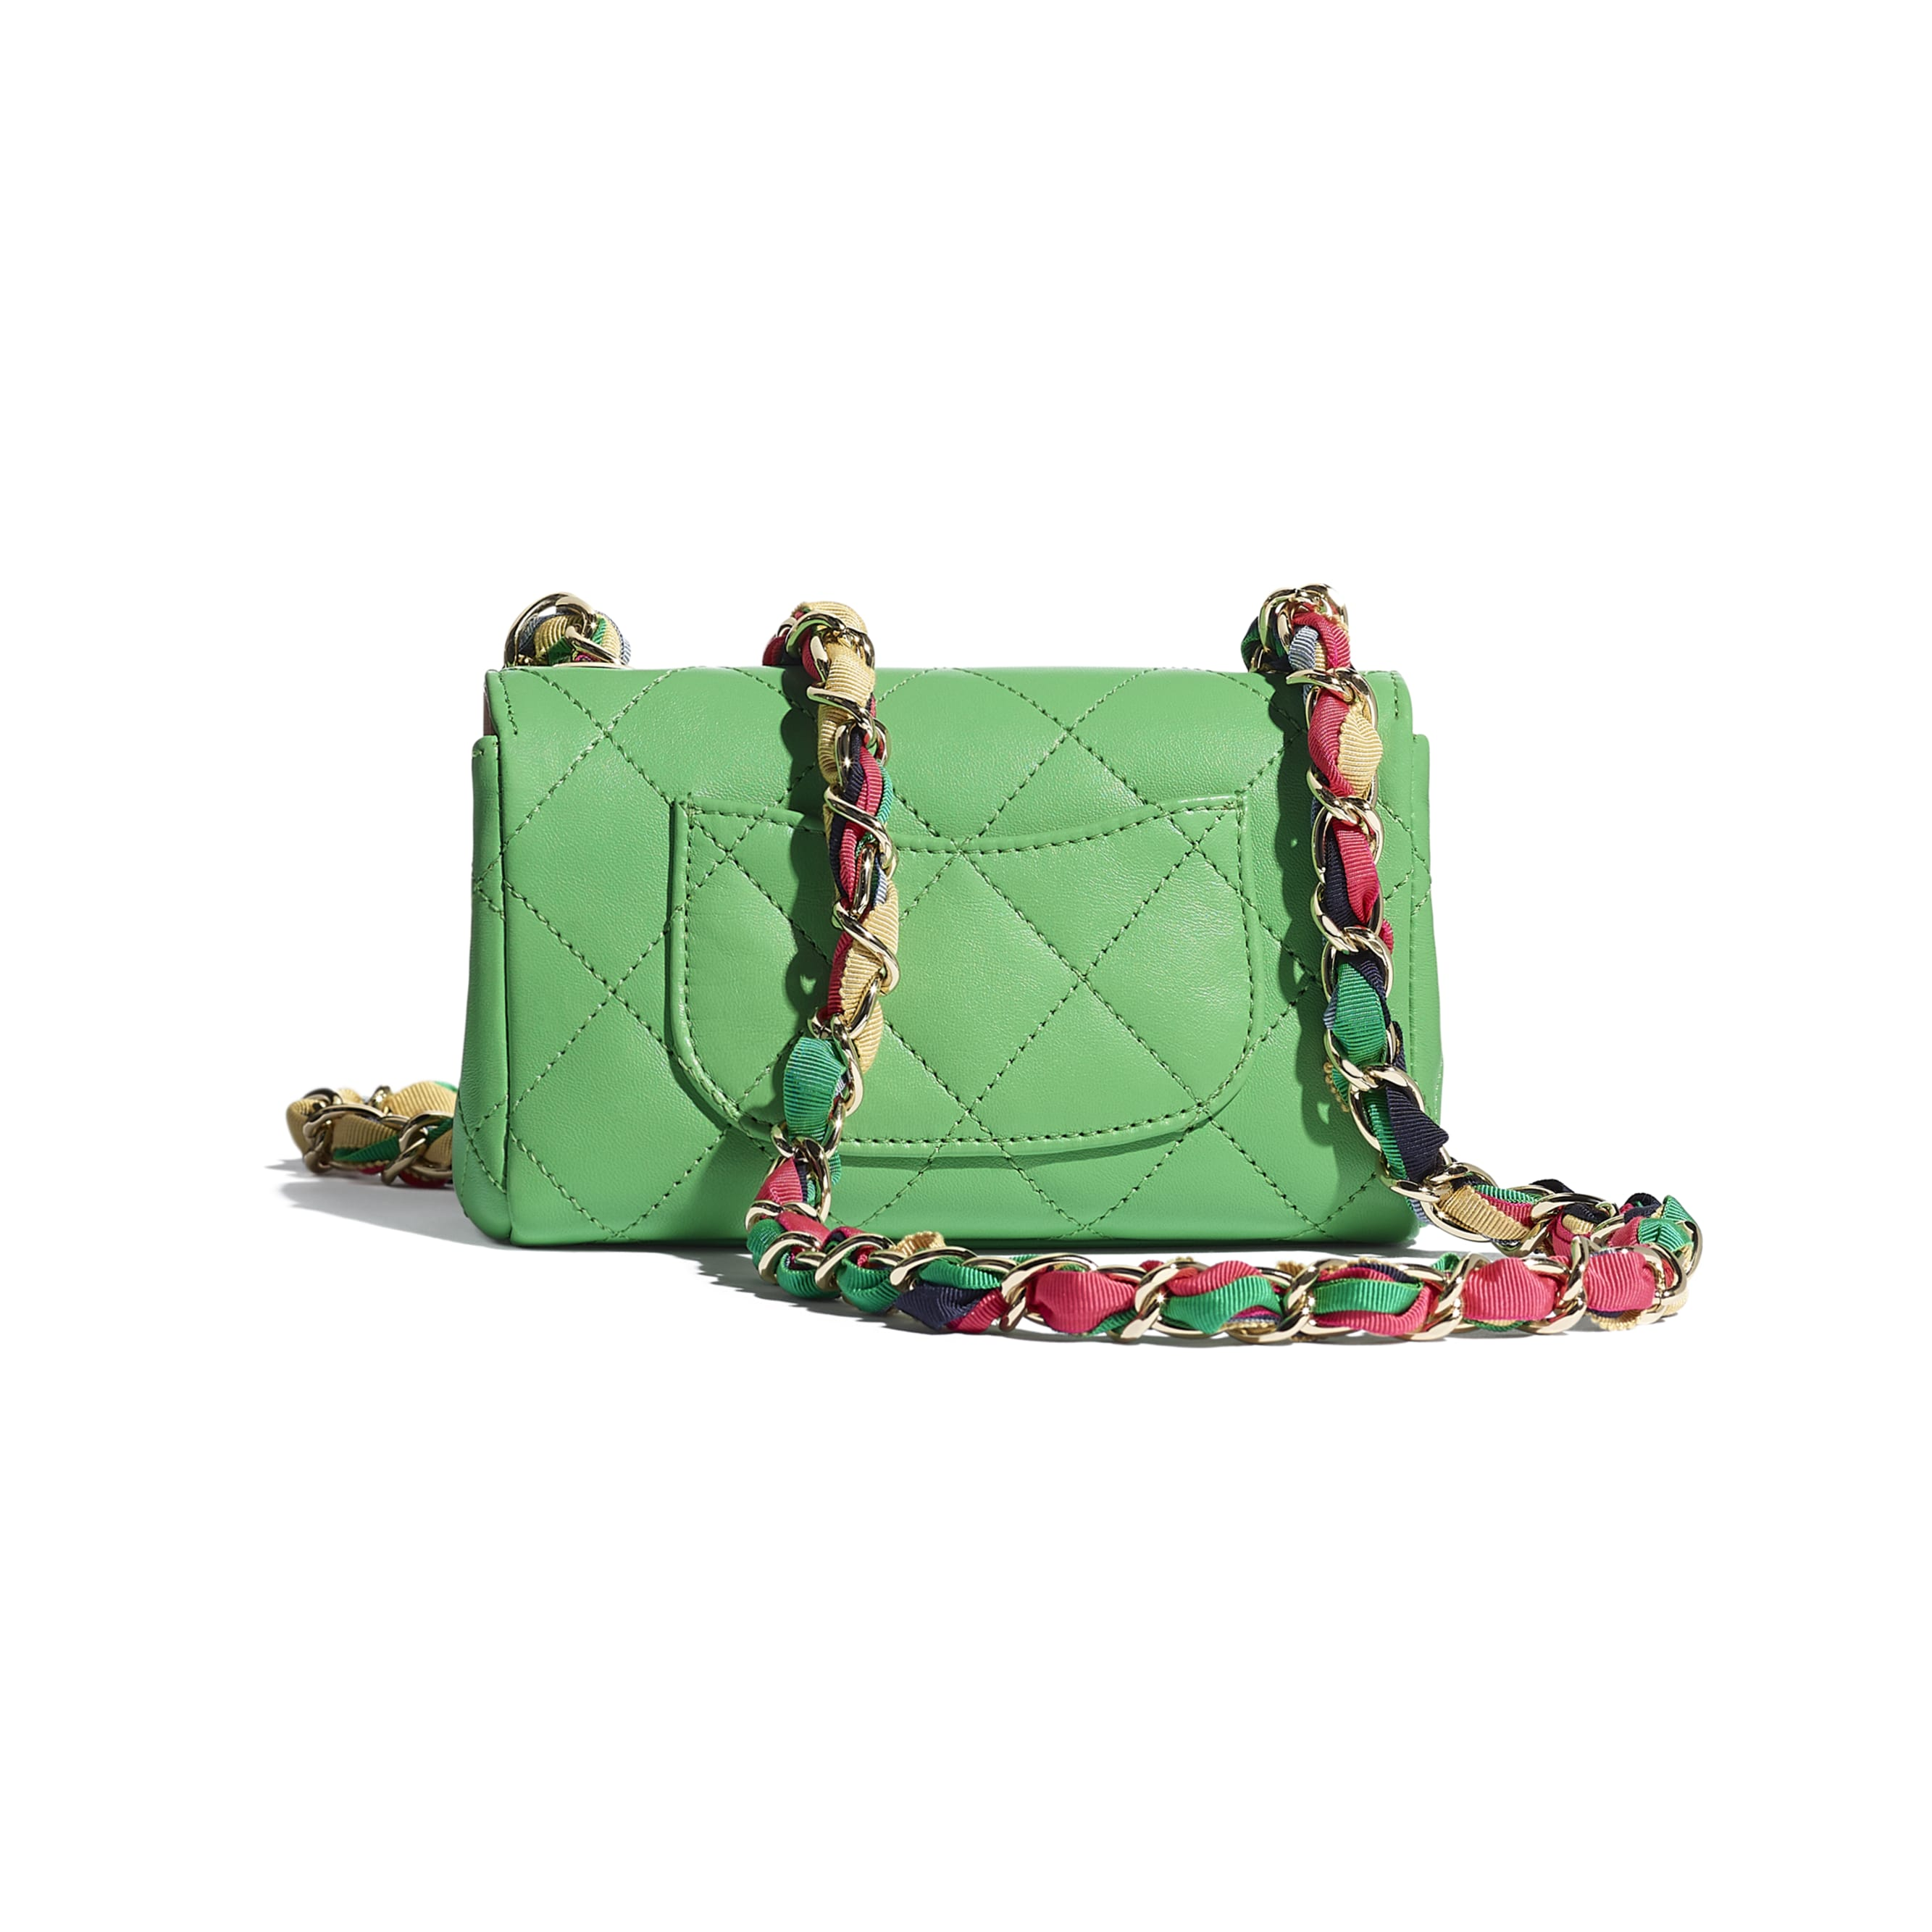 Small Flap Bag - Green - Lambskin, Mixed Fibers & Gold-Tone Metal - CHANEL - Alternative view - see standard sized version